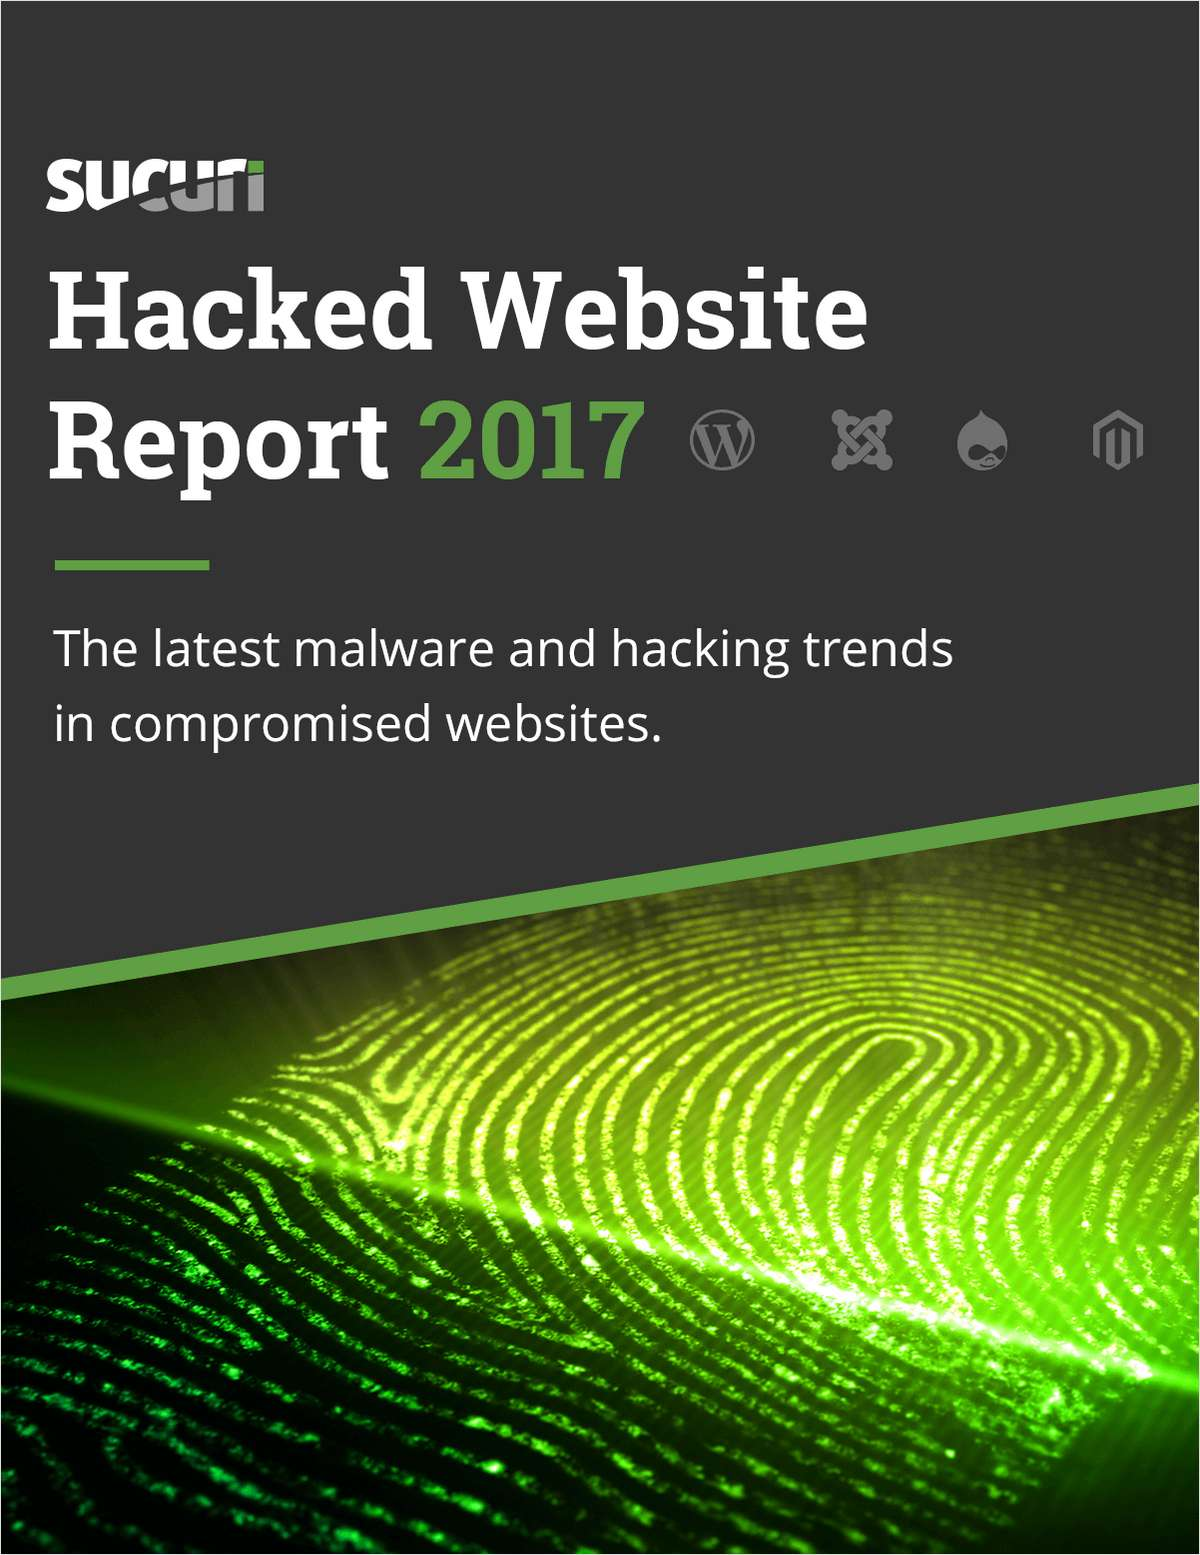 The Hacked Website Report